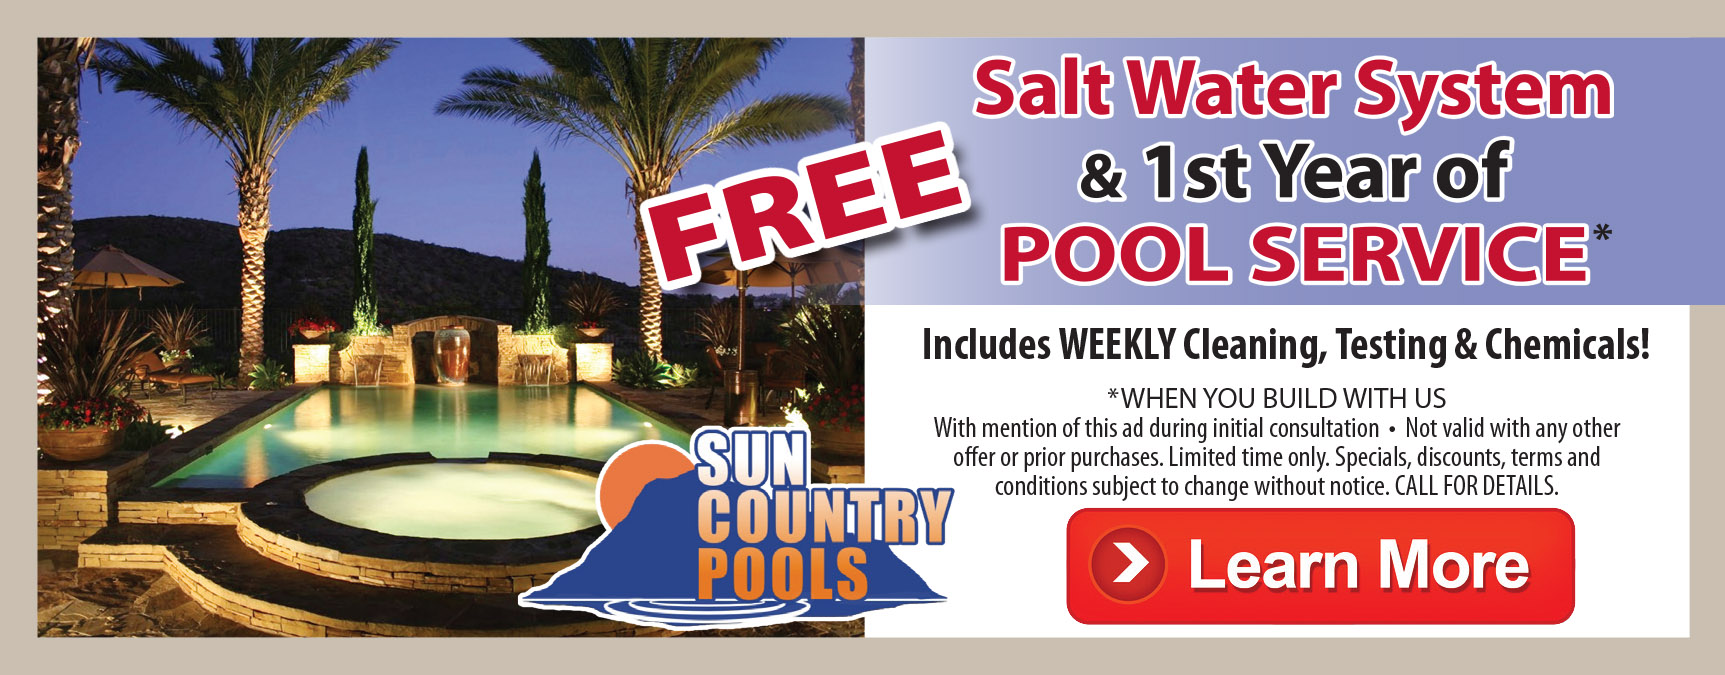 Sun Country Pools_Offer_Reg_05-18.jpg